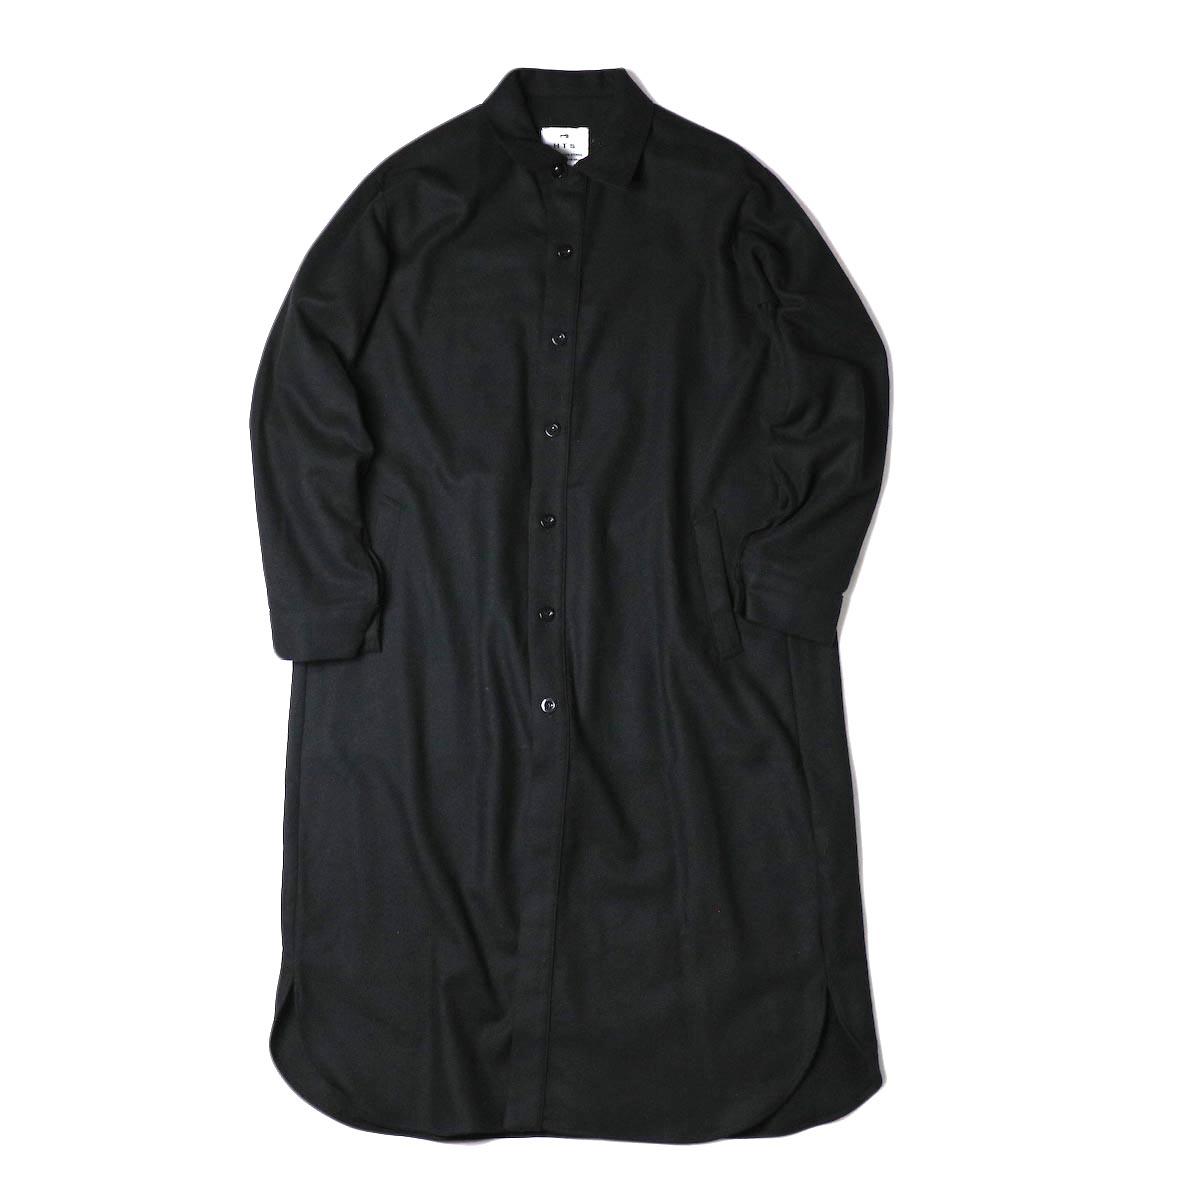 HTS / WORK BUTTON LONG SHIRT (Black)